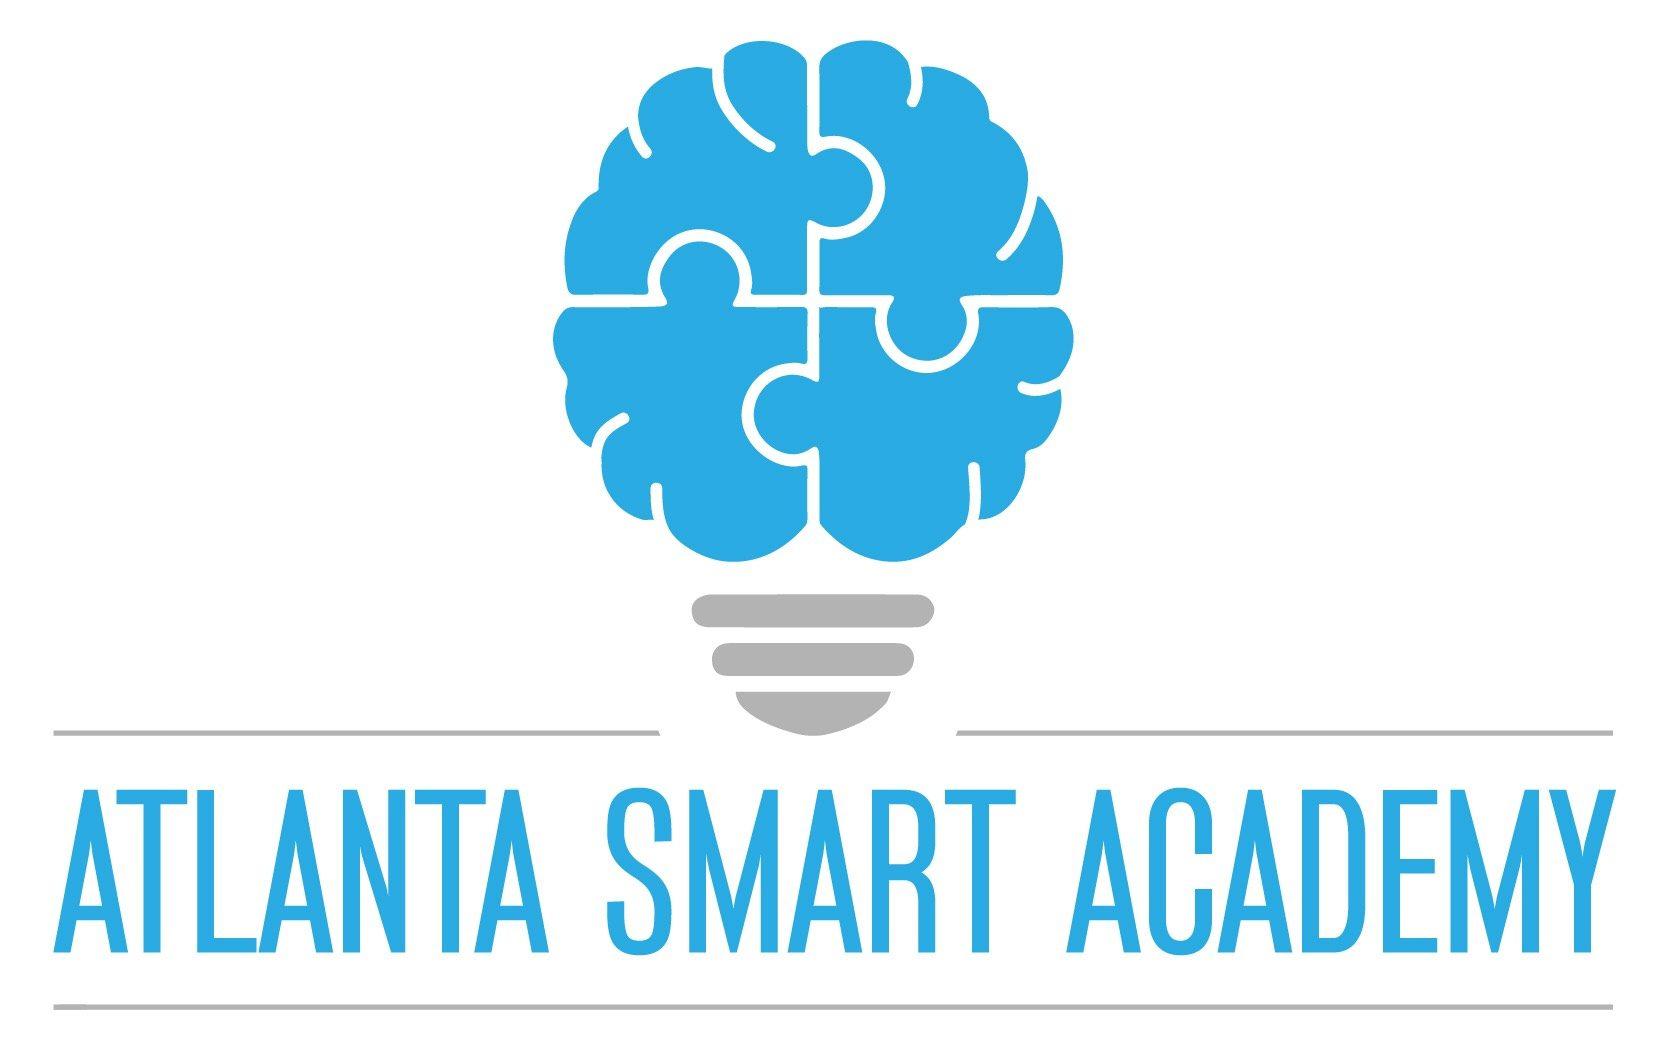 Atlanta SMART Academy